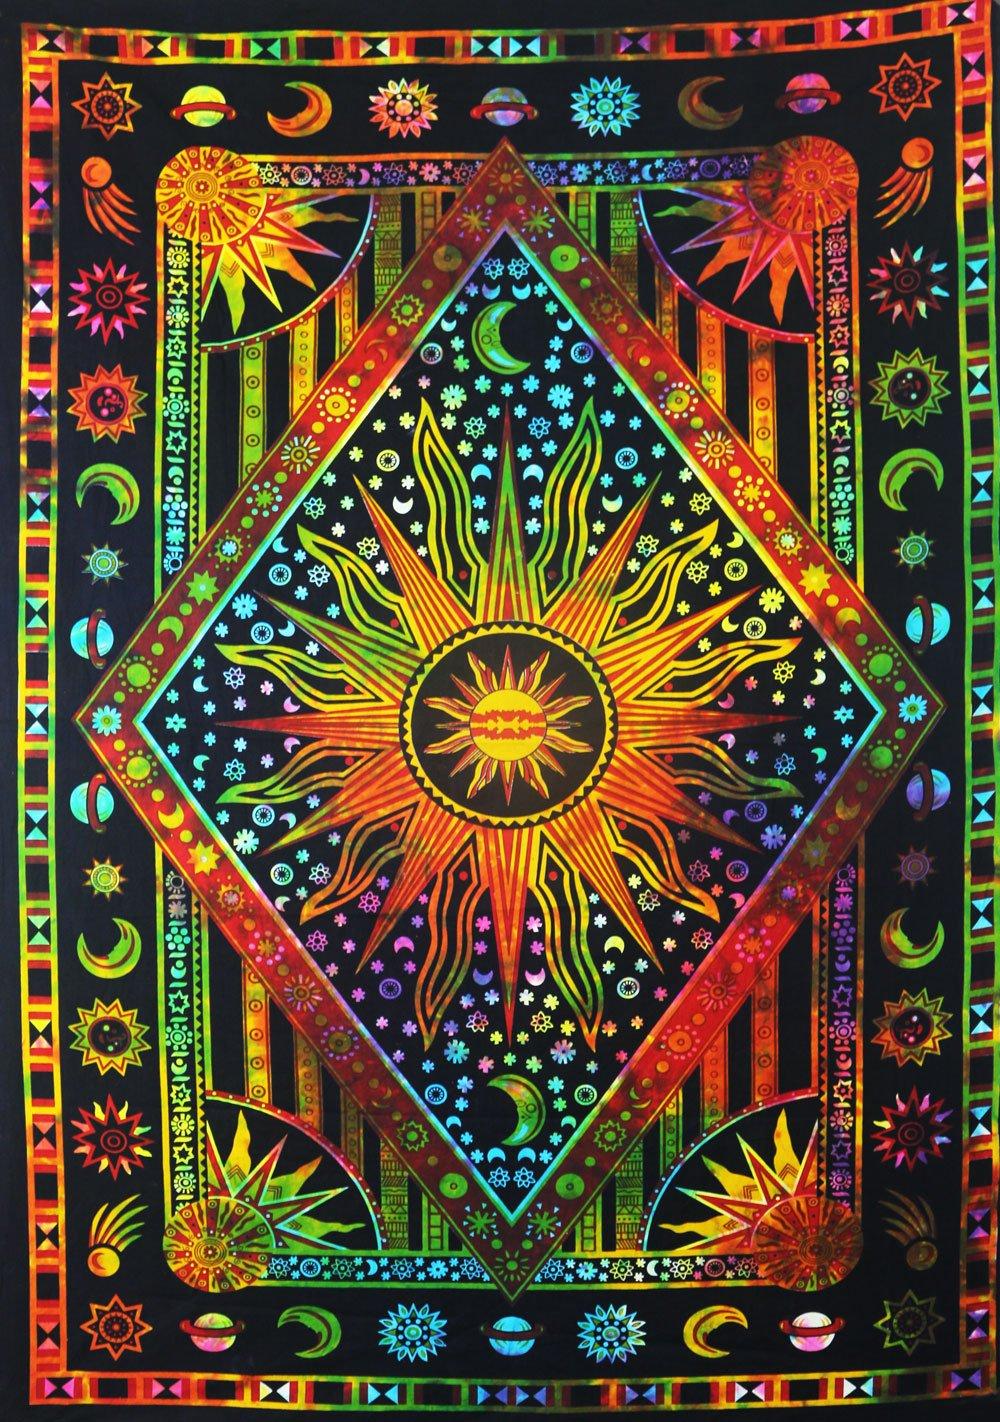 Future Handmade Mandala Sun Moon Tie Dye Doppia Parete arazzo arazzo Hippie Tapestry Wall Hanging Mandala Beach Throw Boho arazzi Bohemien Dimensioni 205, 7x 139, 7cm FH41